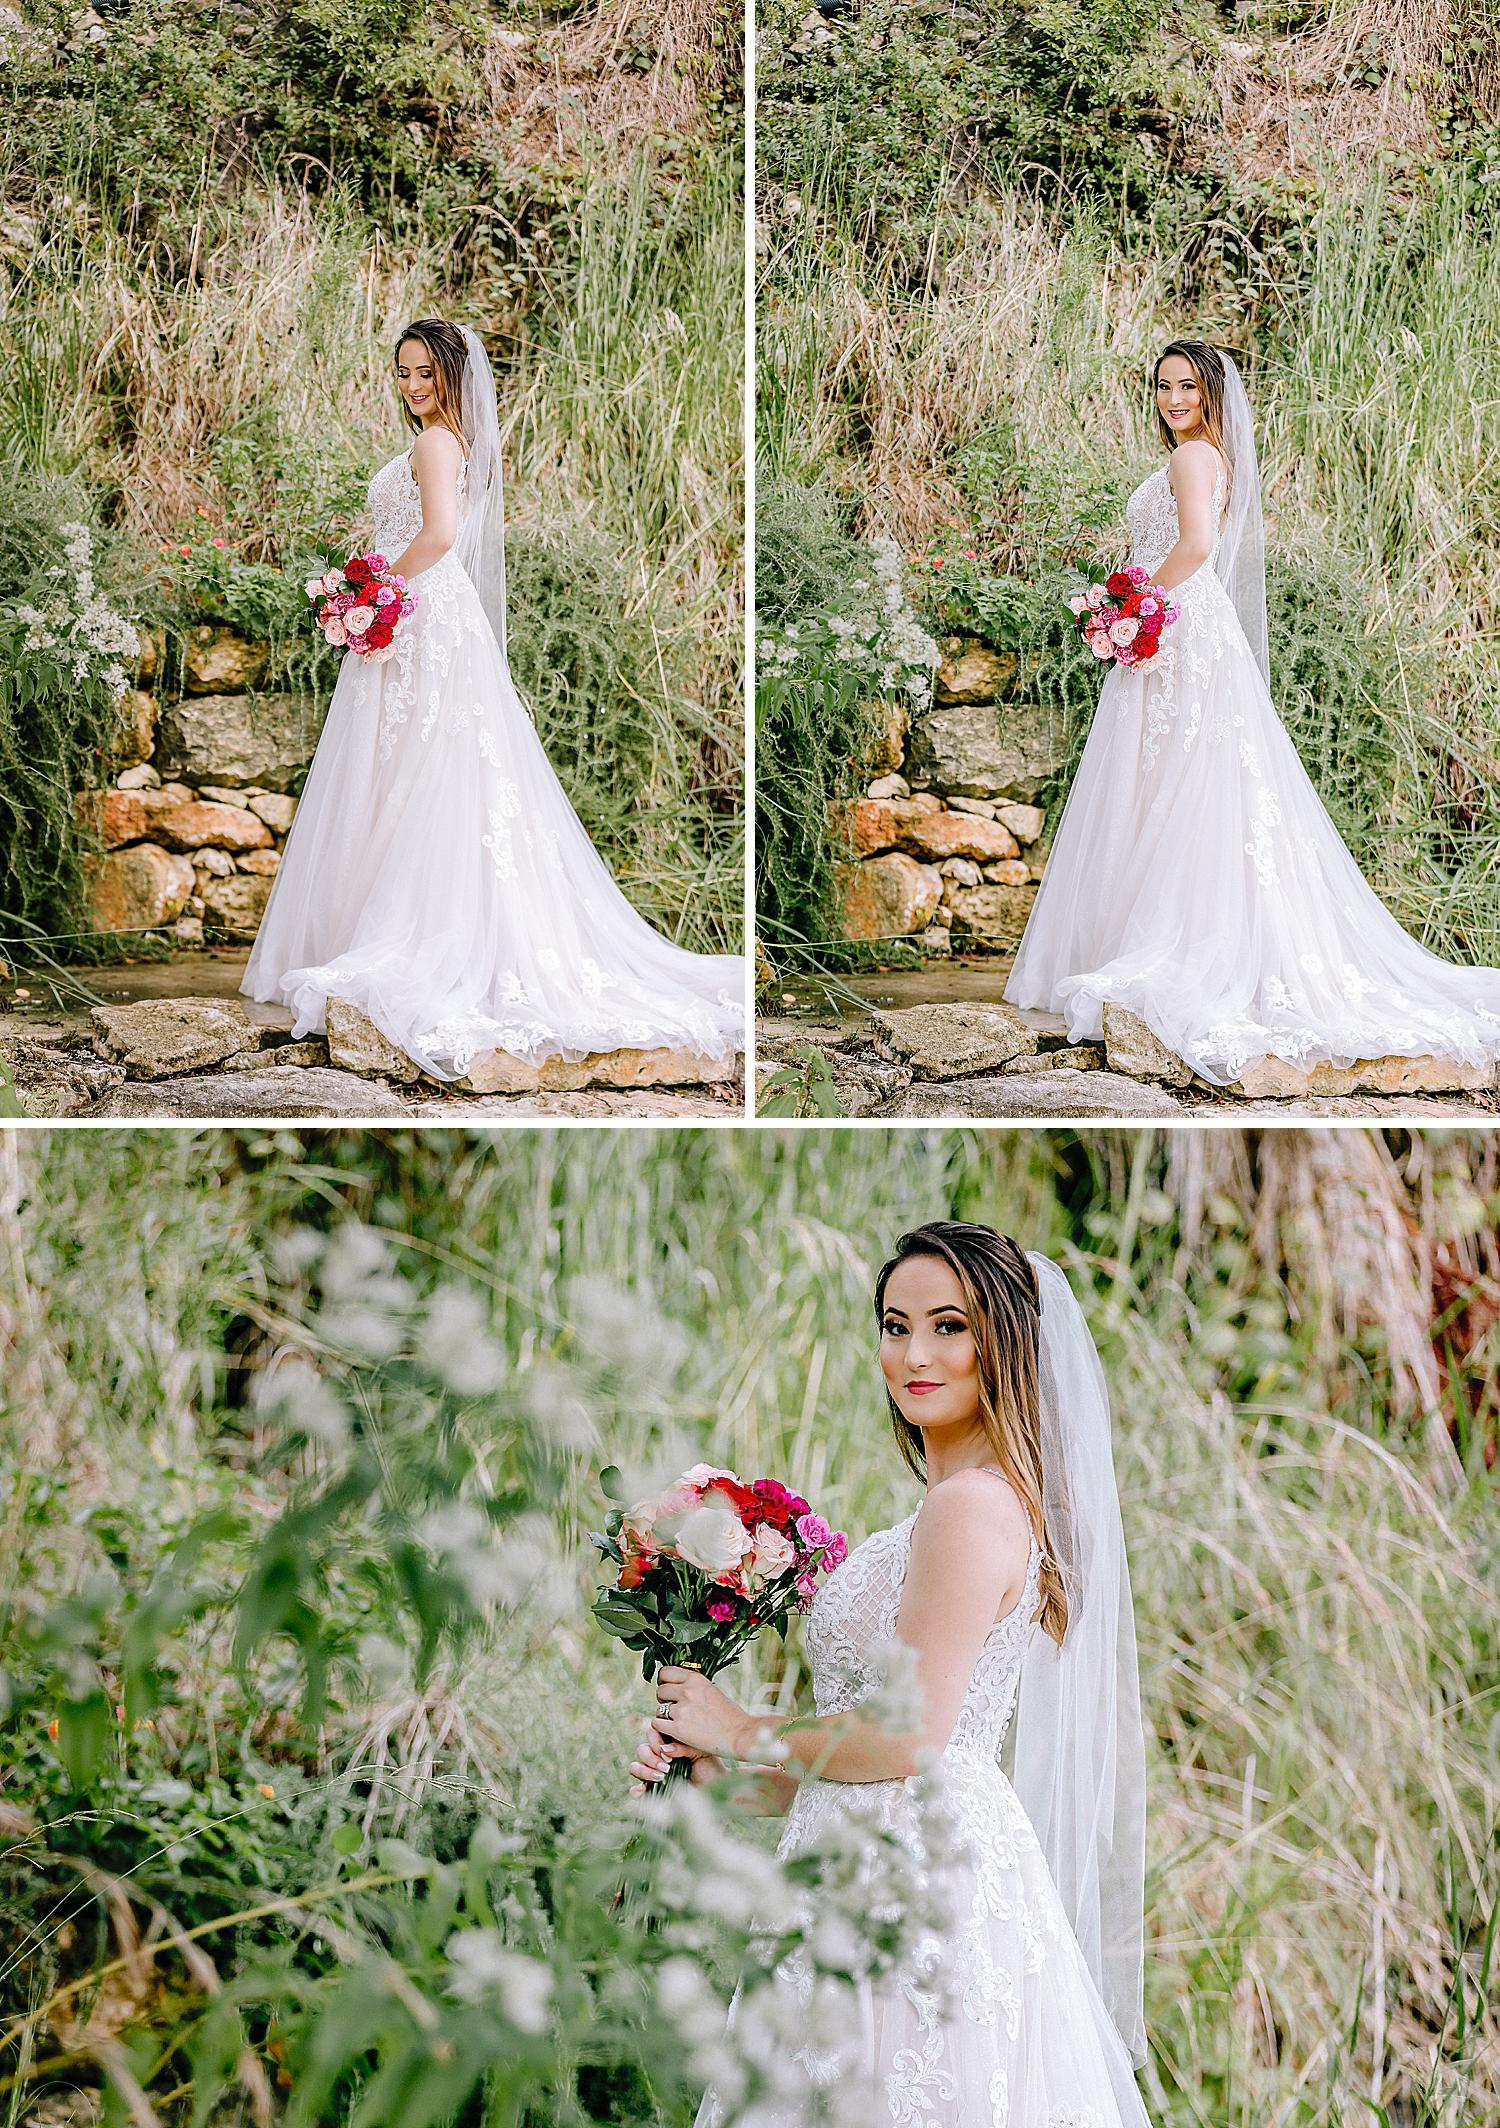 Carly-Barton-Photography-Bridal-Photos-Remis-Ridge-Hidden-Falls-New-Braunfels-Texas-Bride_0024.jpg